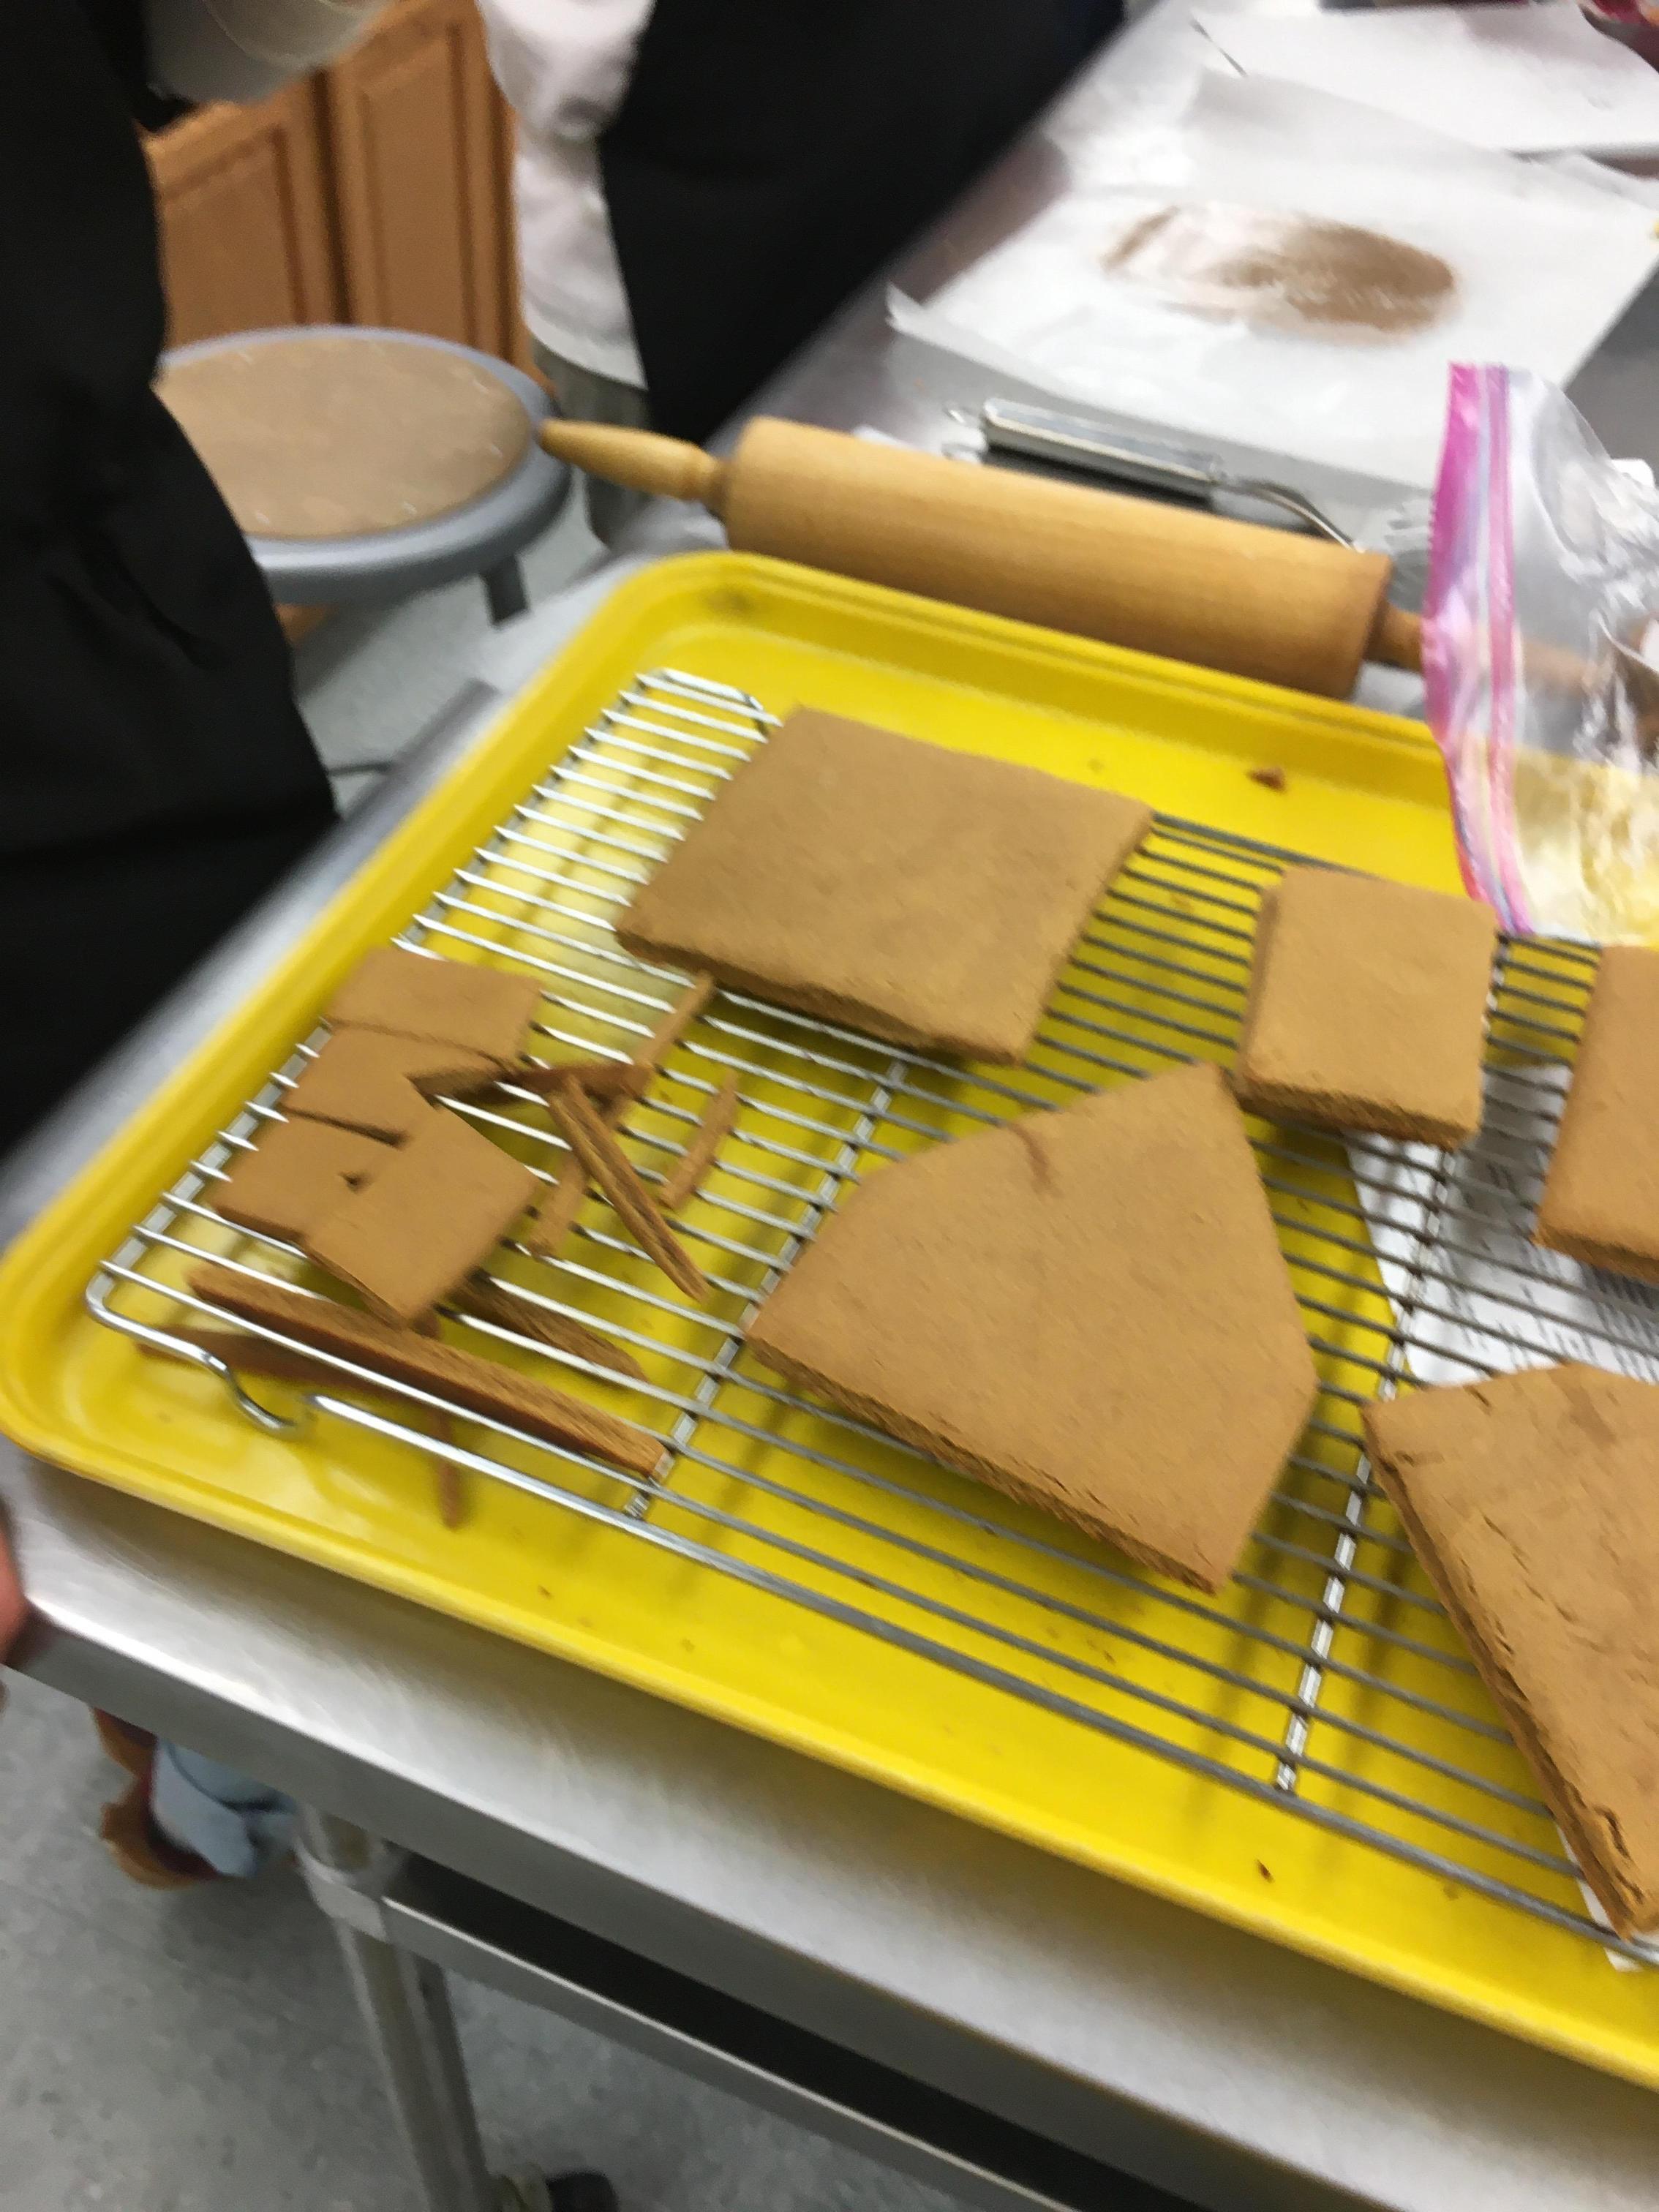 Gingerbread House Bake